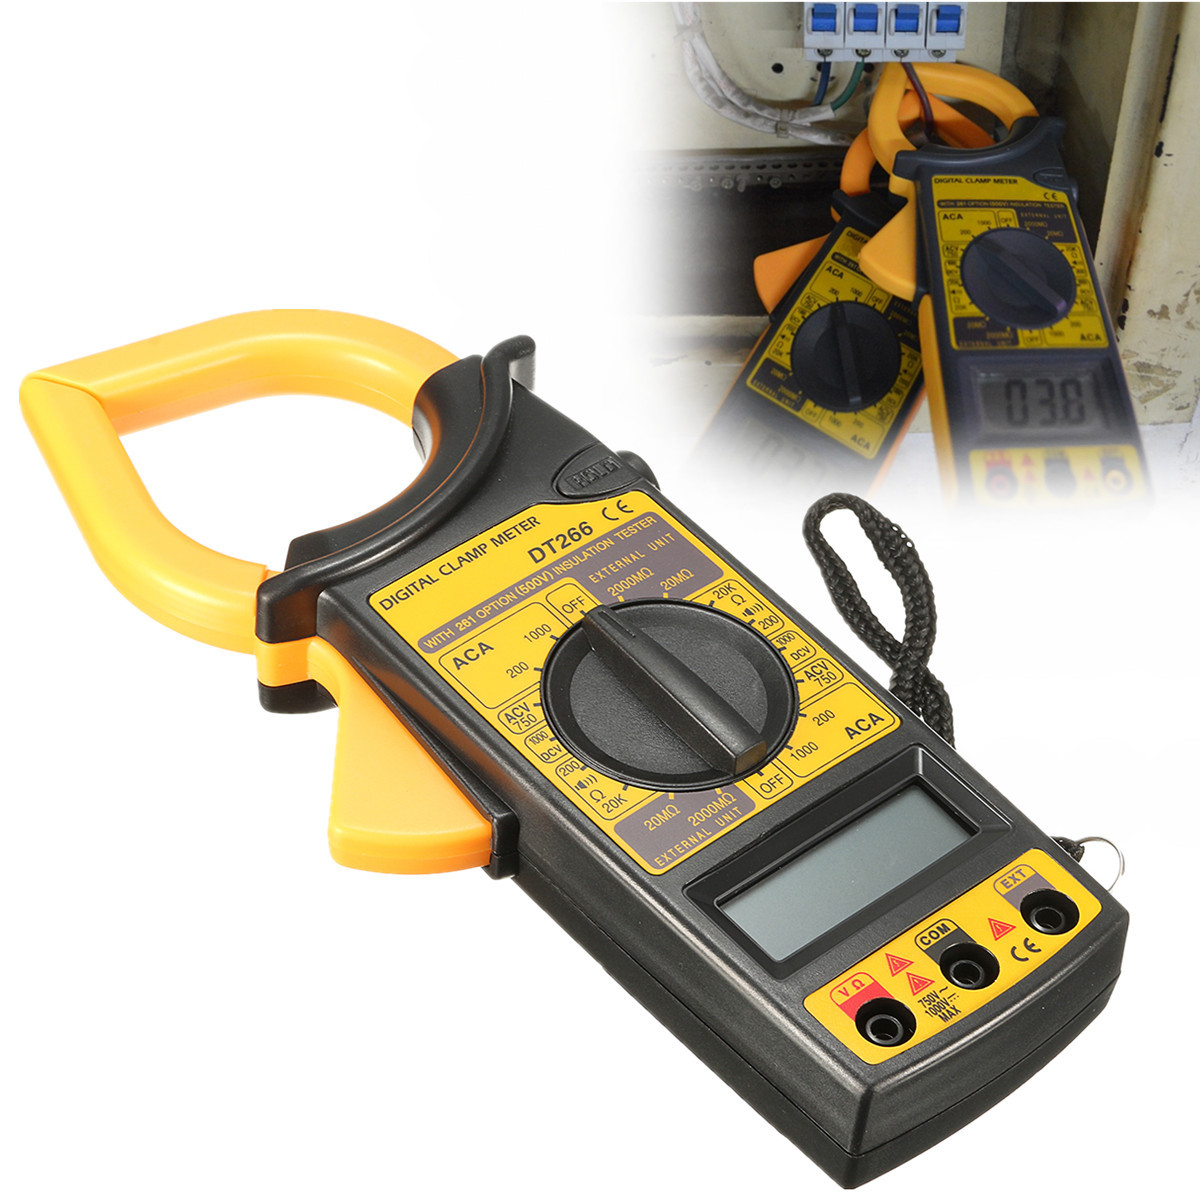 Digital Clamp Meter Dt 266 : Dt electronic digital clamp meter multimeter ac dc